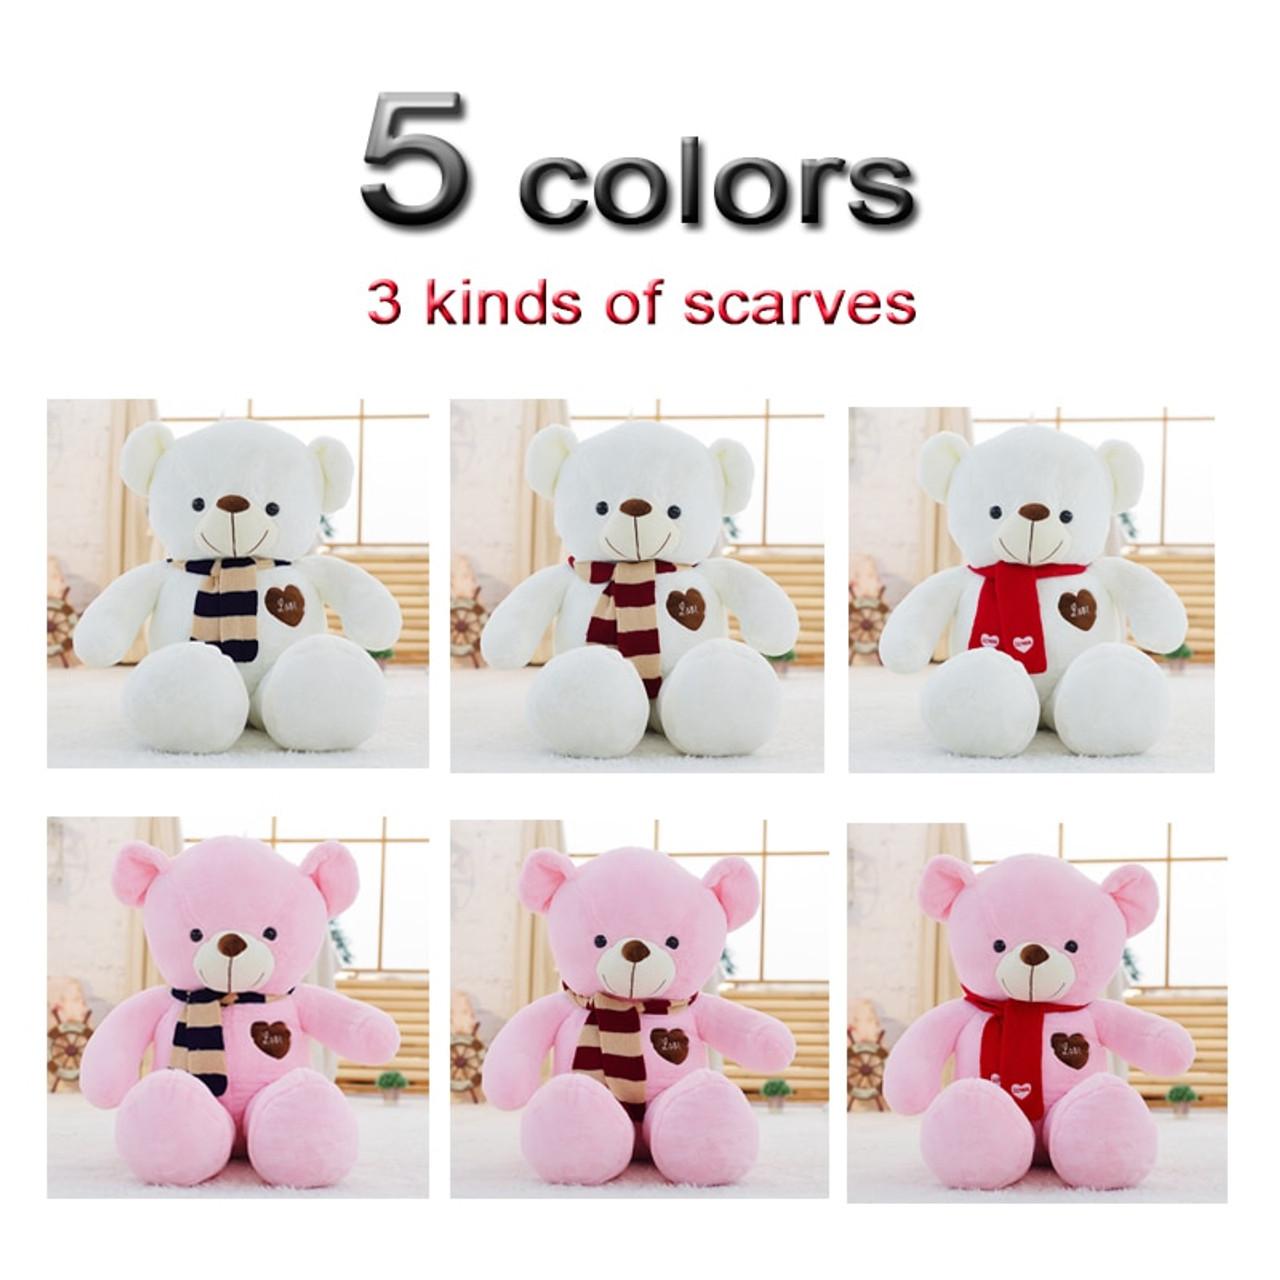 6b534f27c ... Soft Big Teddy Bear Stuffed Animal Plush Toy With Scarf 80cm100cm  Kawaii Large Bears For Kids ...